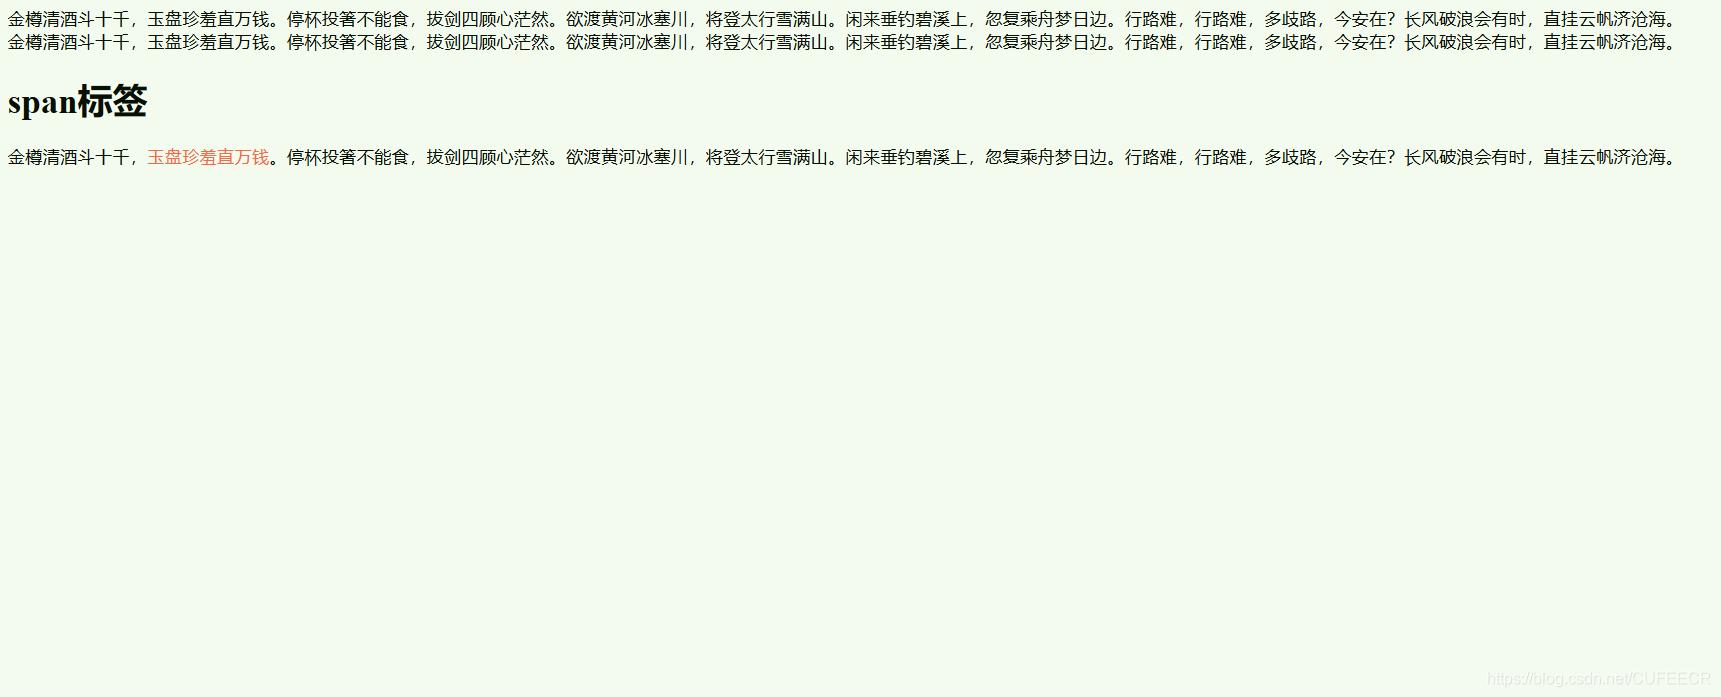 html span